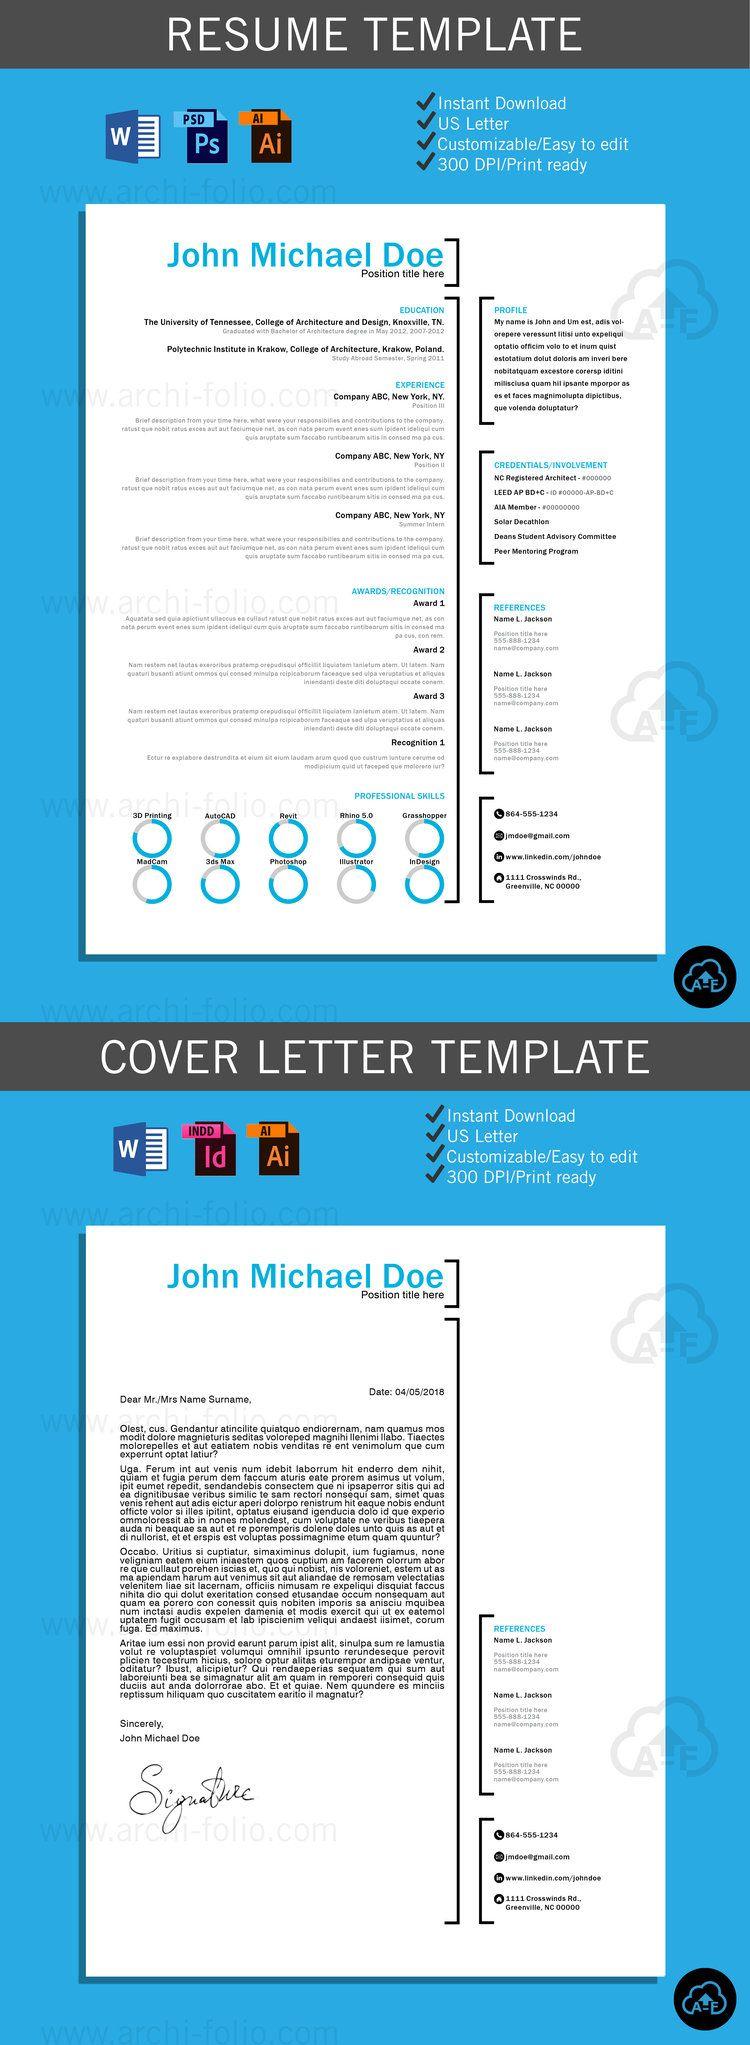 architectural resume for internship pdf